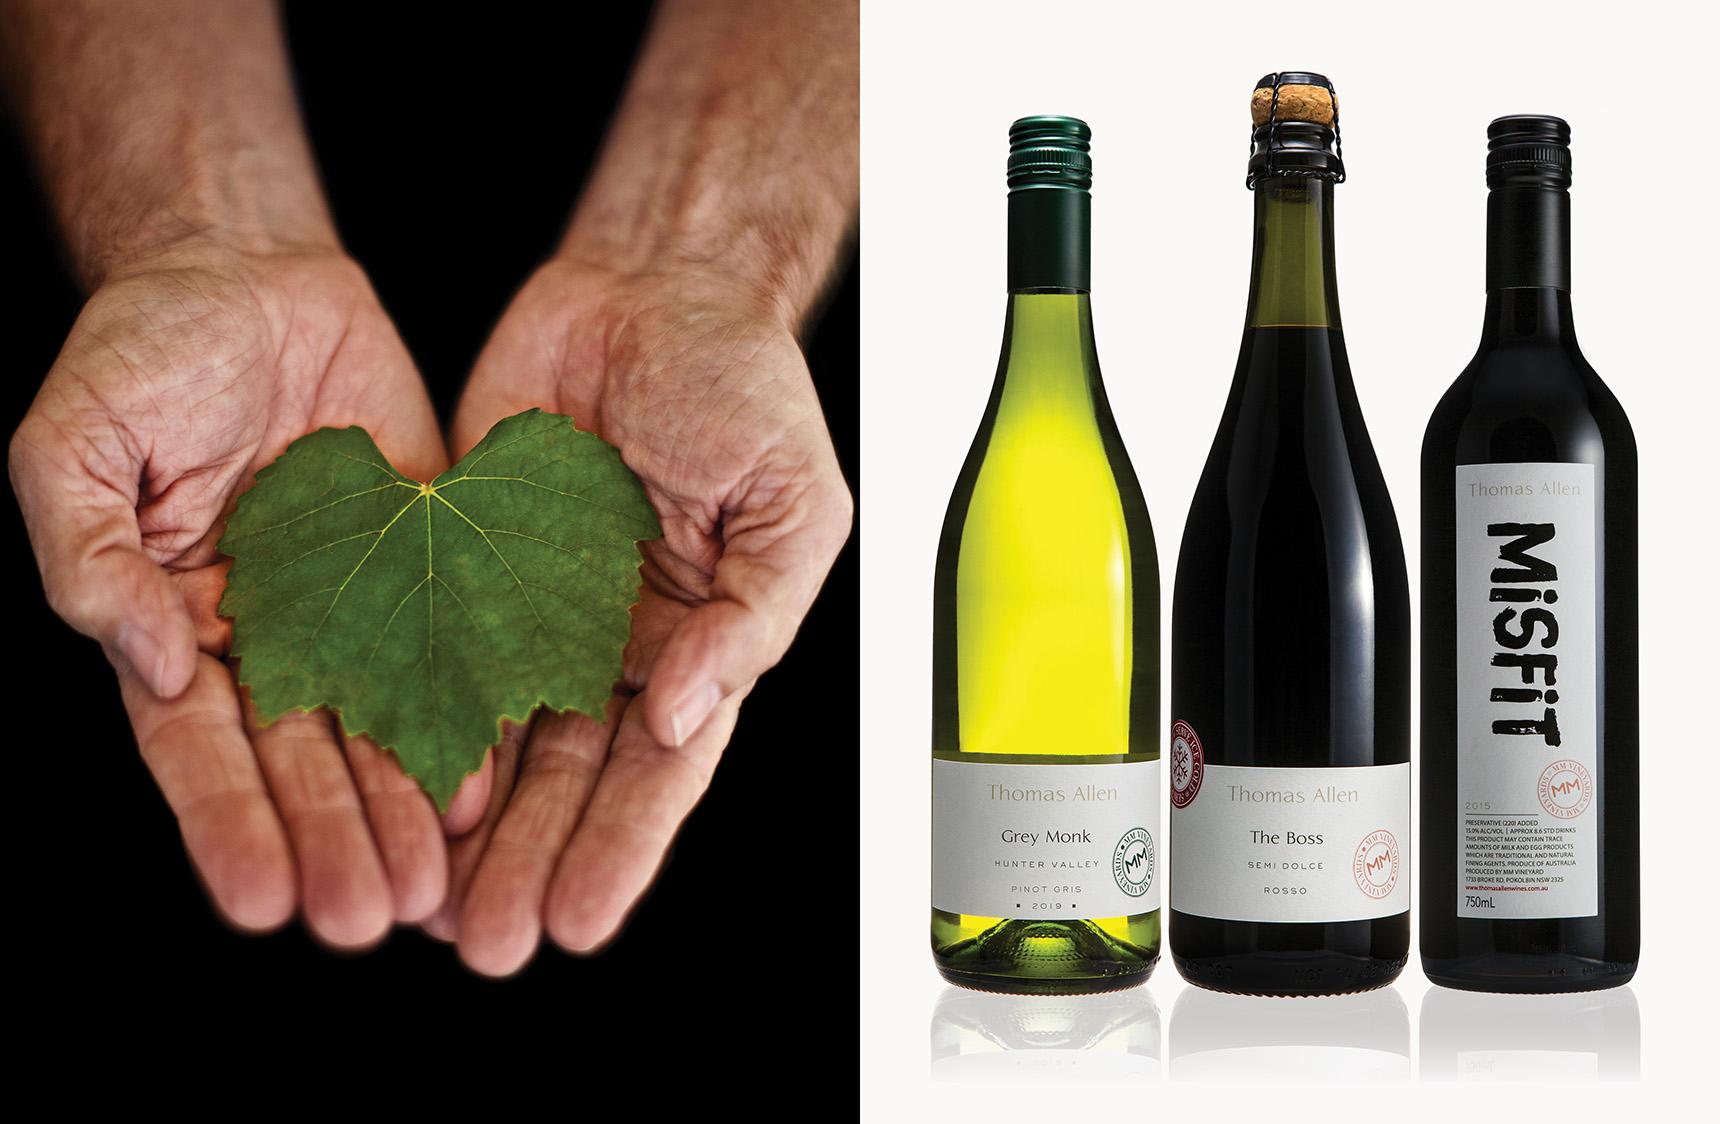 mjk_thomas-allen-wines_05